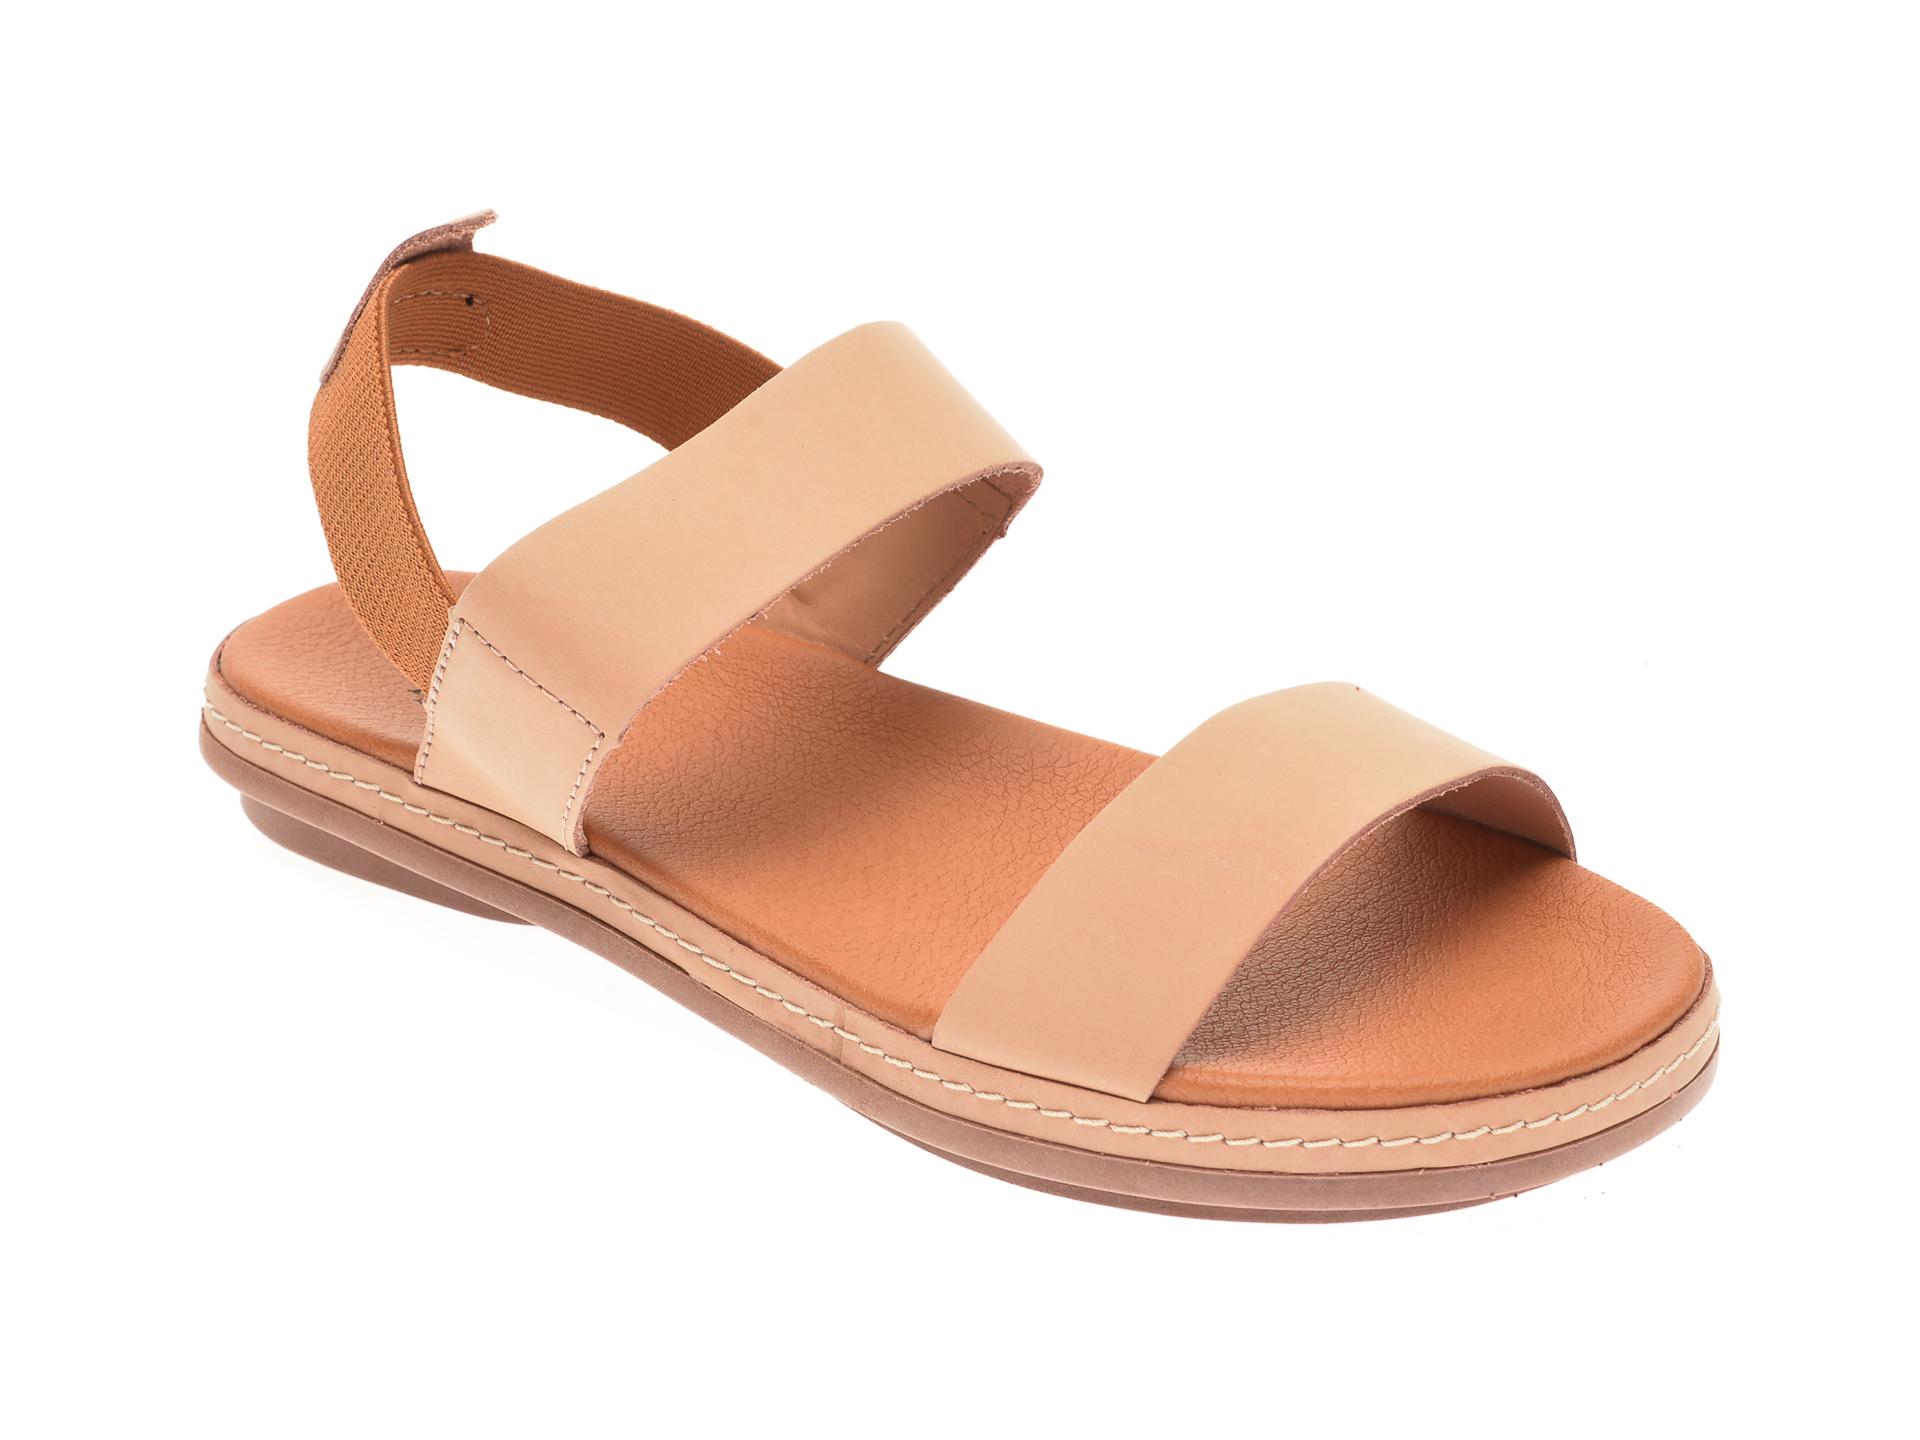 Sandale FLAVIA PASSINI nude, 21804, din piele naturala